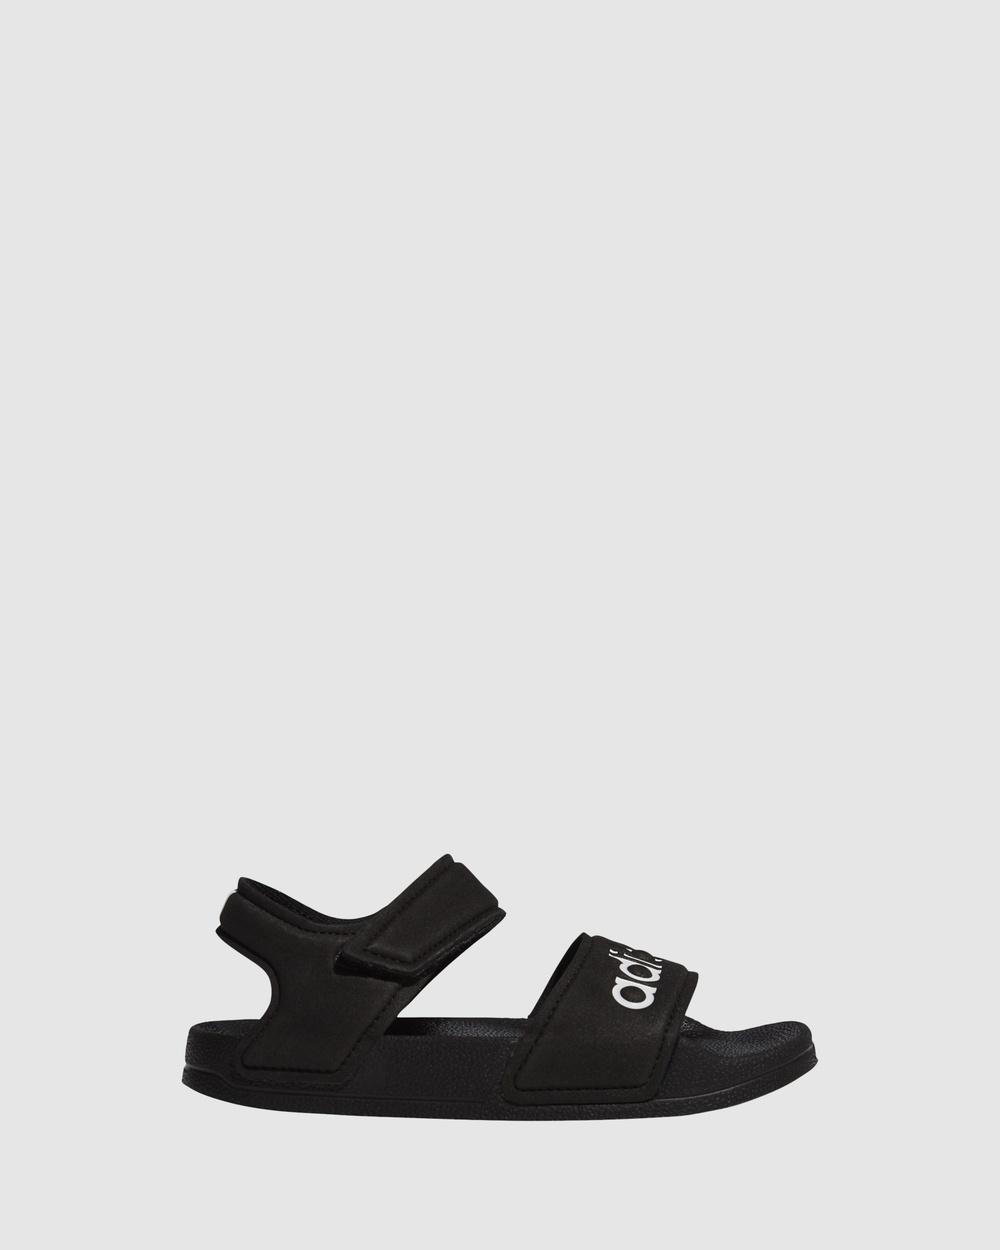 adidas Performance Adilette Sandal K Sandals Black/White